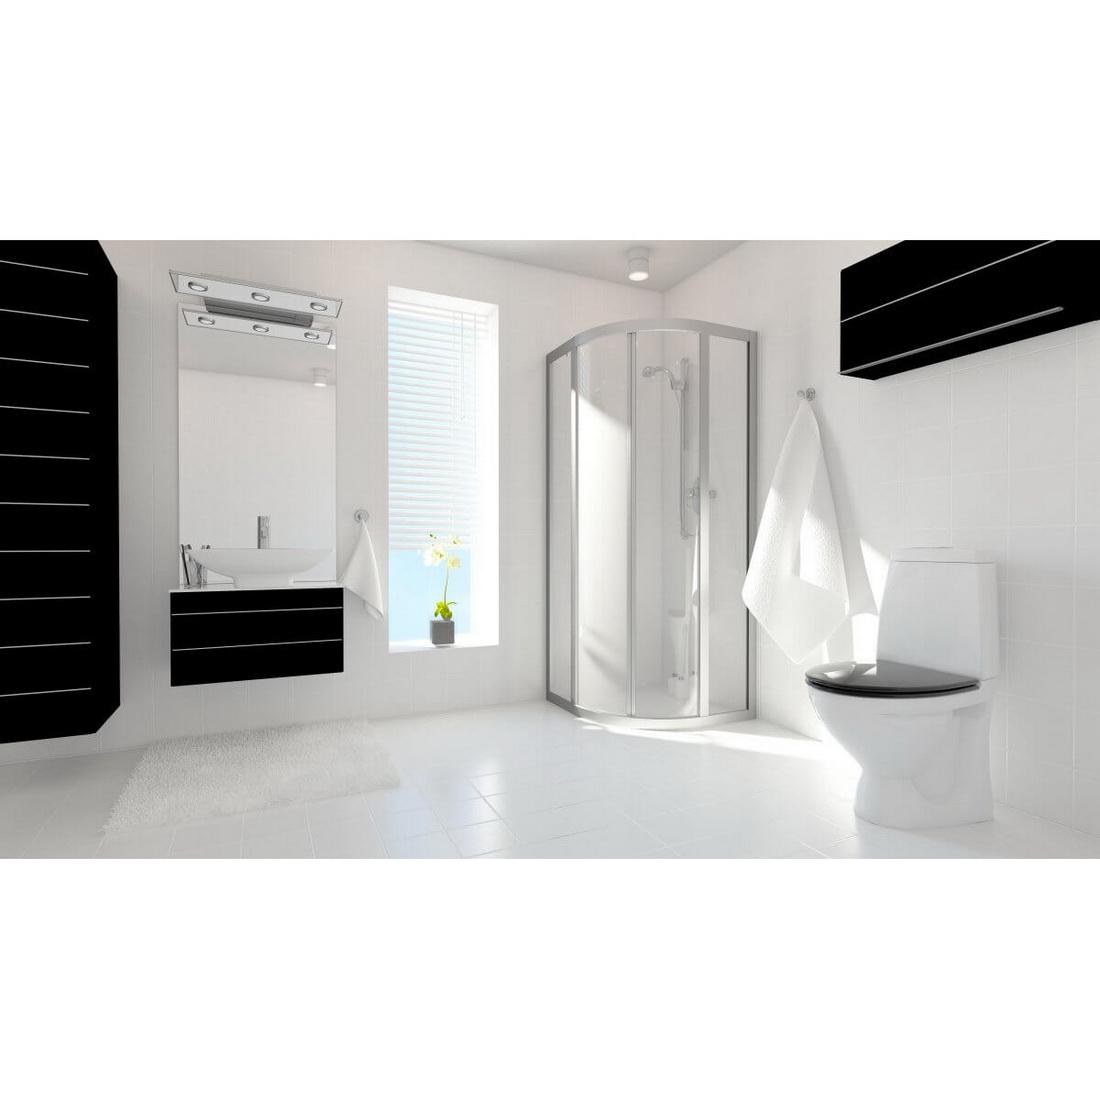 Showerline 2400 x 900 x 4.75mm Acp Wet Wall Lining White